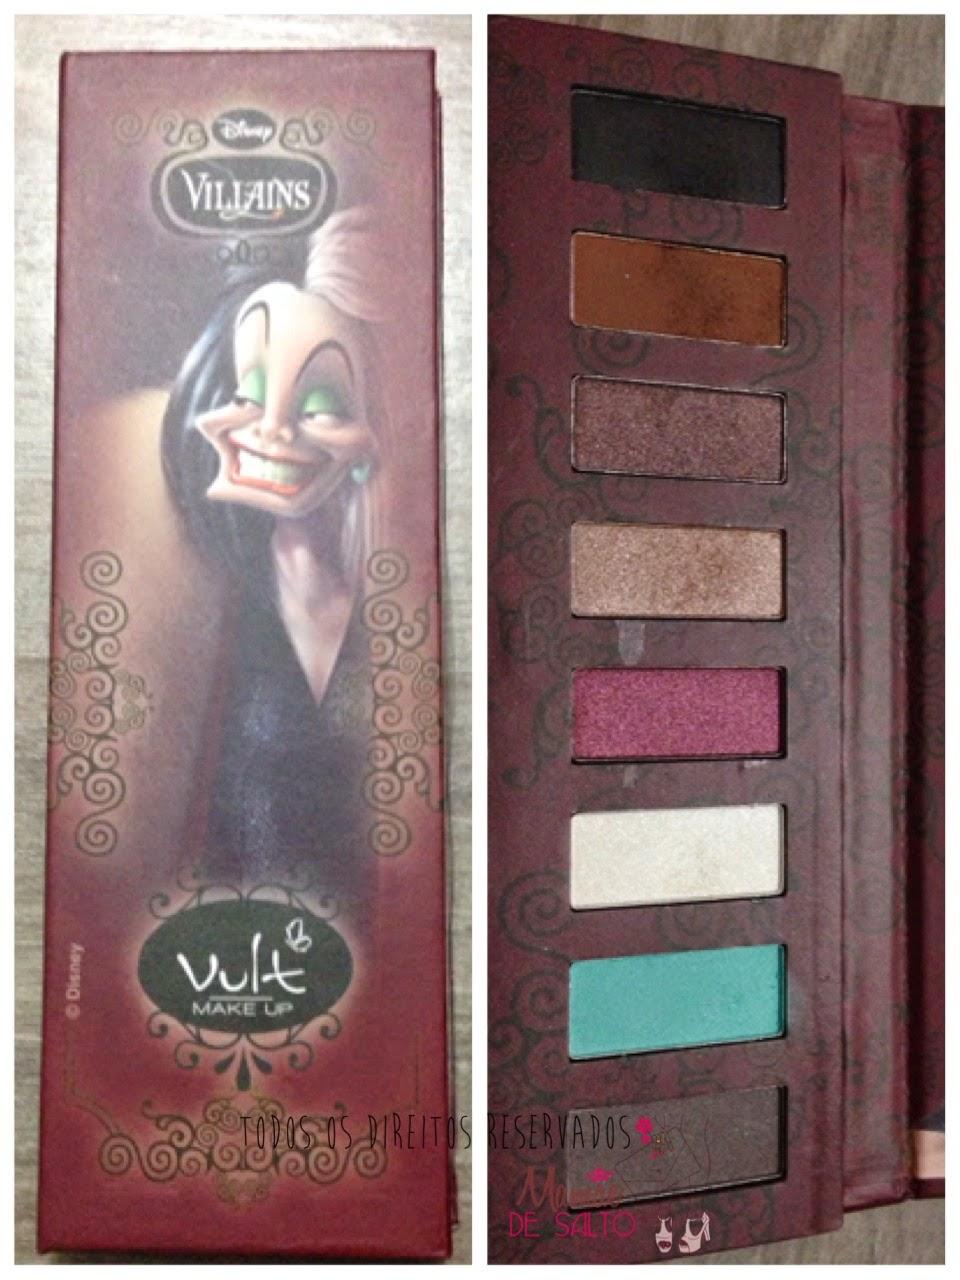 Paleta de sombras Cruela De Vil Vult Make Up => blog Mamãe de Salto